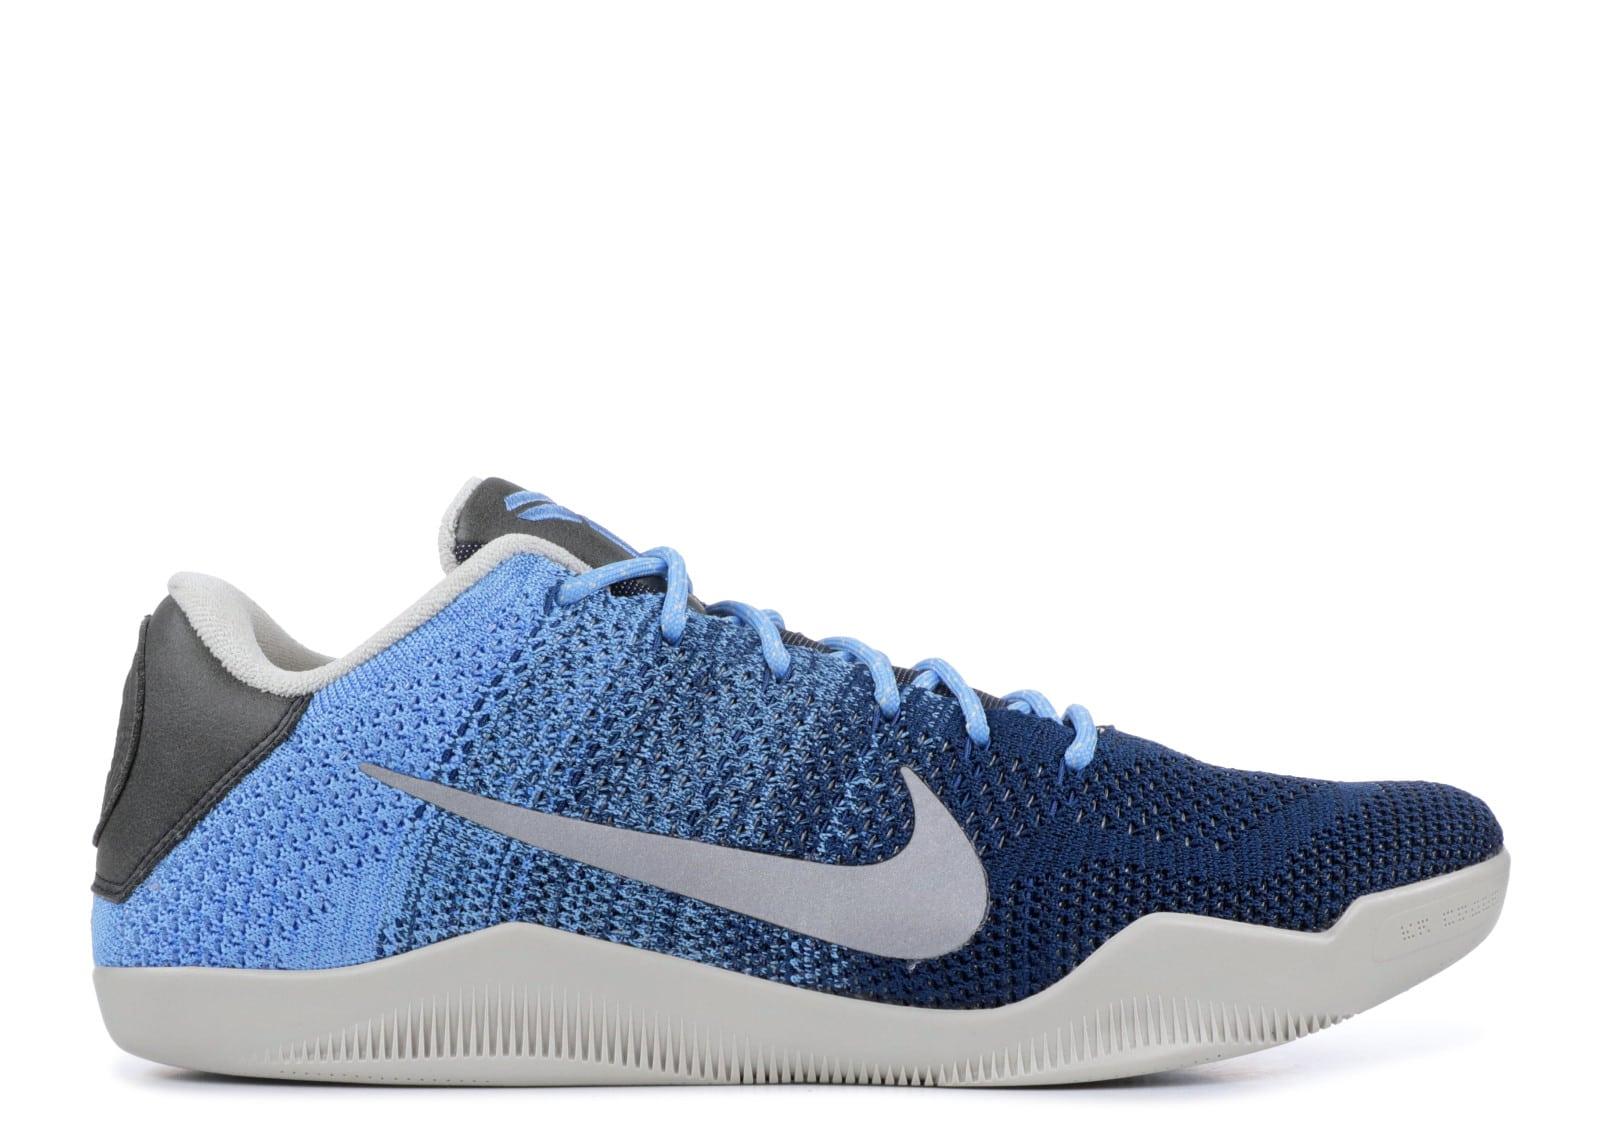 Nike Kobe 11 Low 'Brave Blue' - kickstw